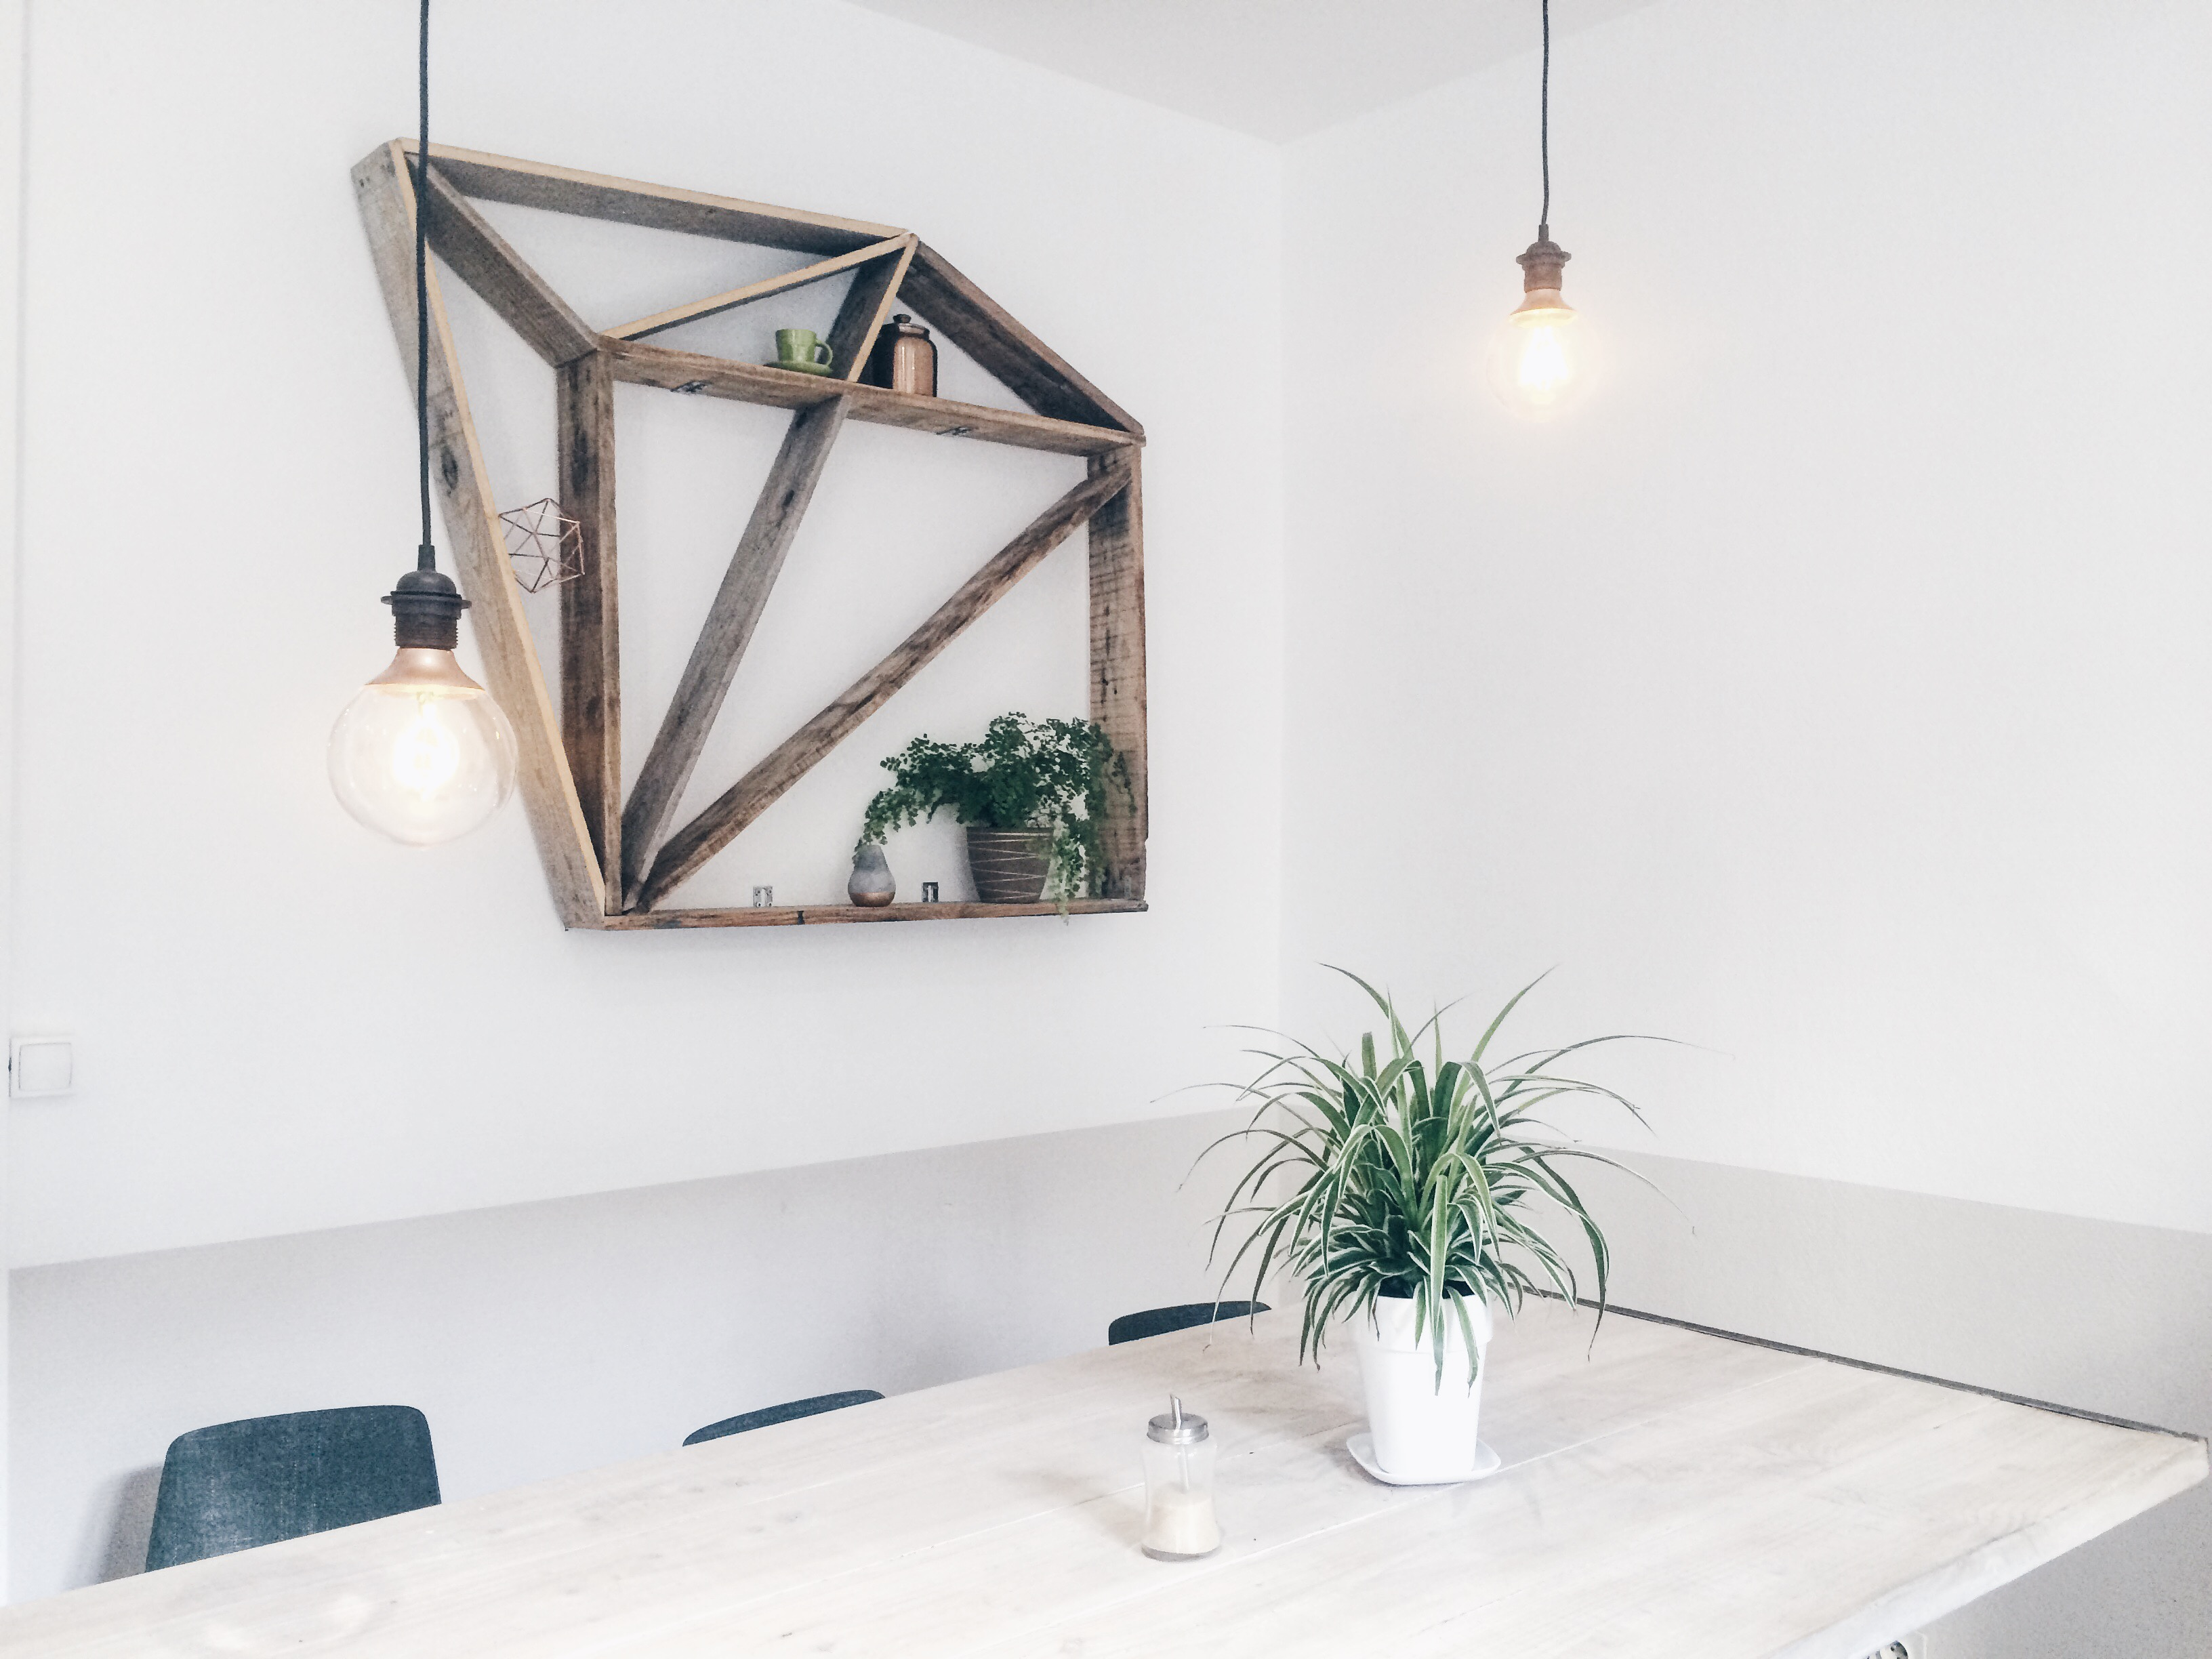 BONNE ADRESSE – Morning Glory Café [Dijon]